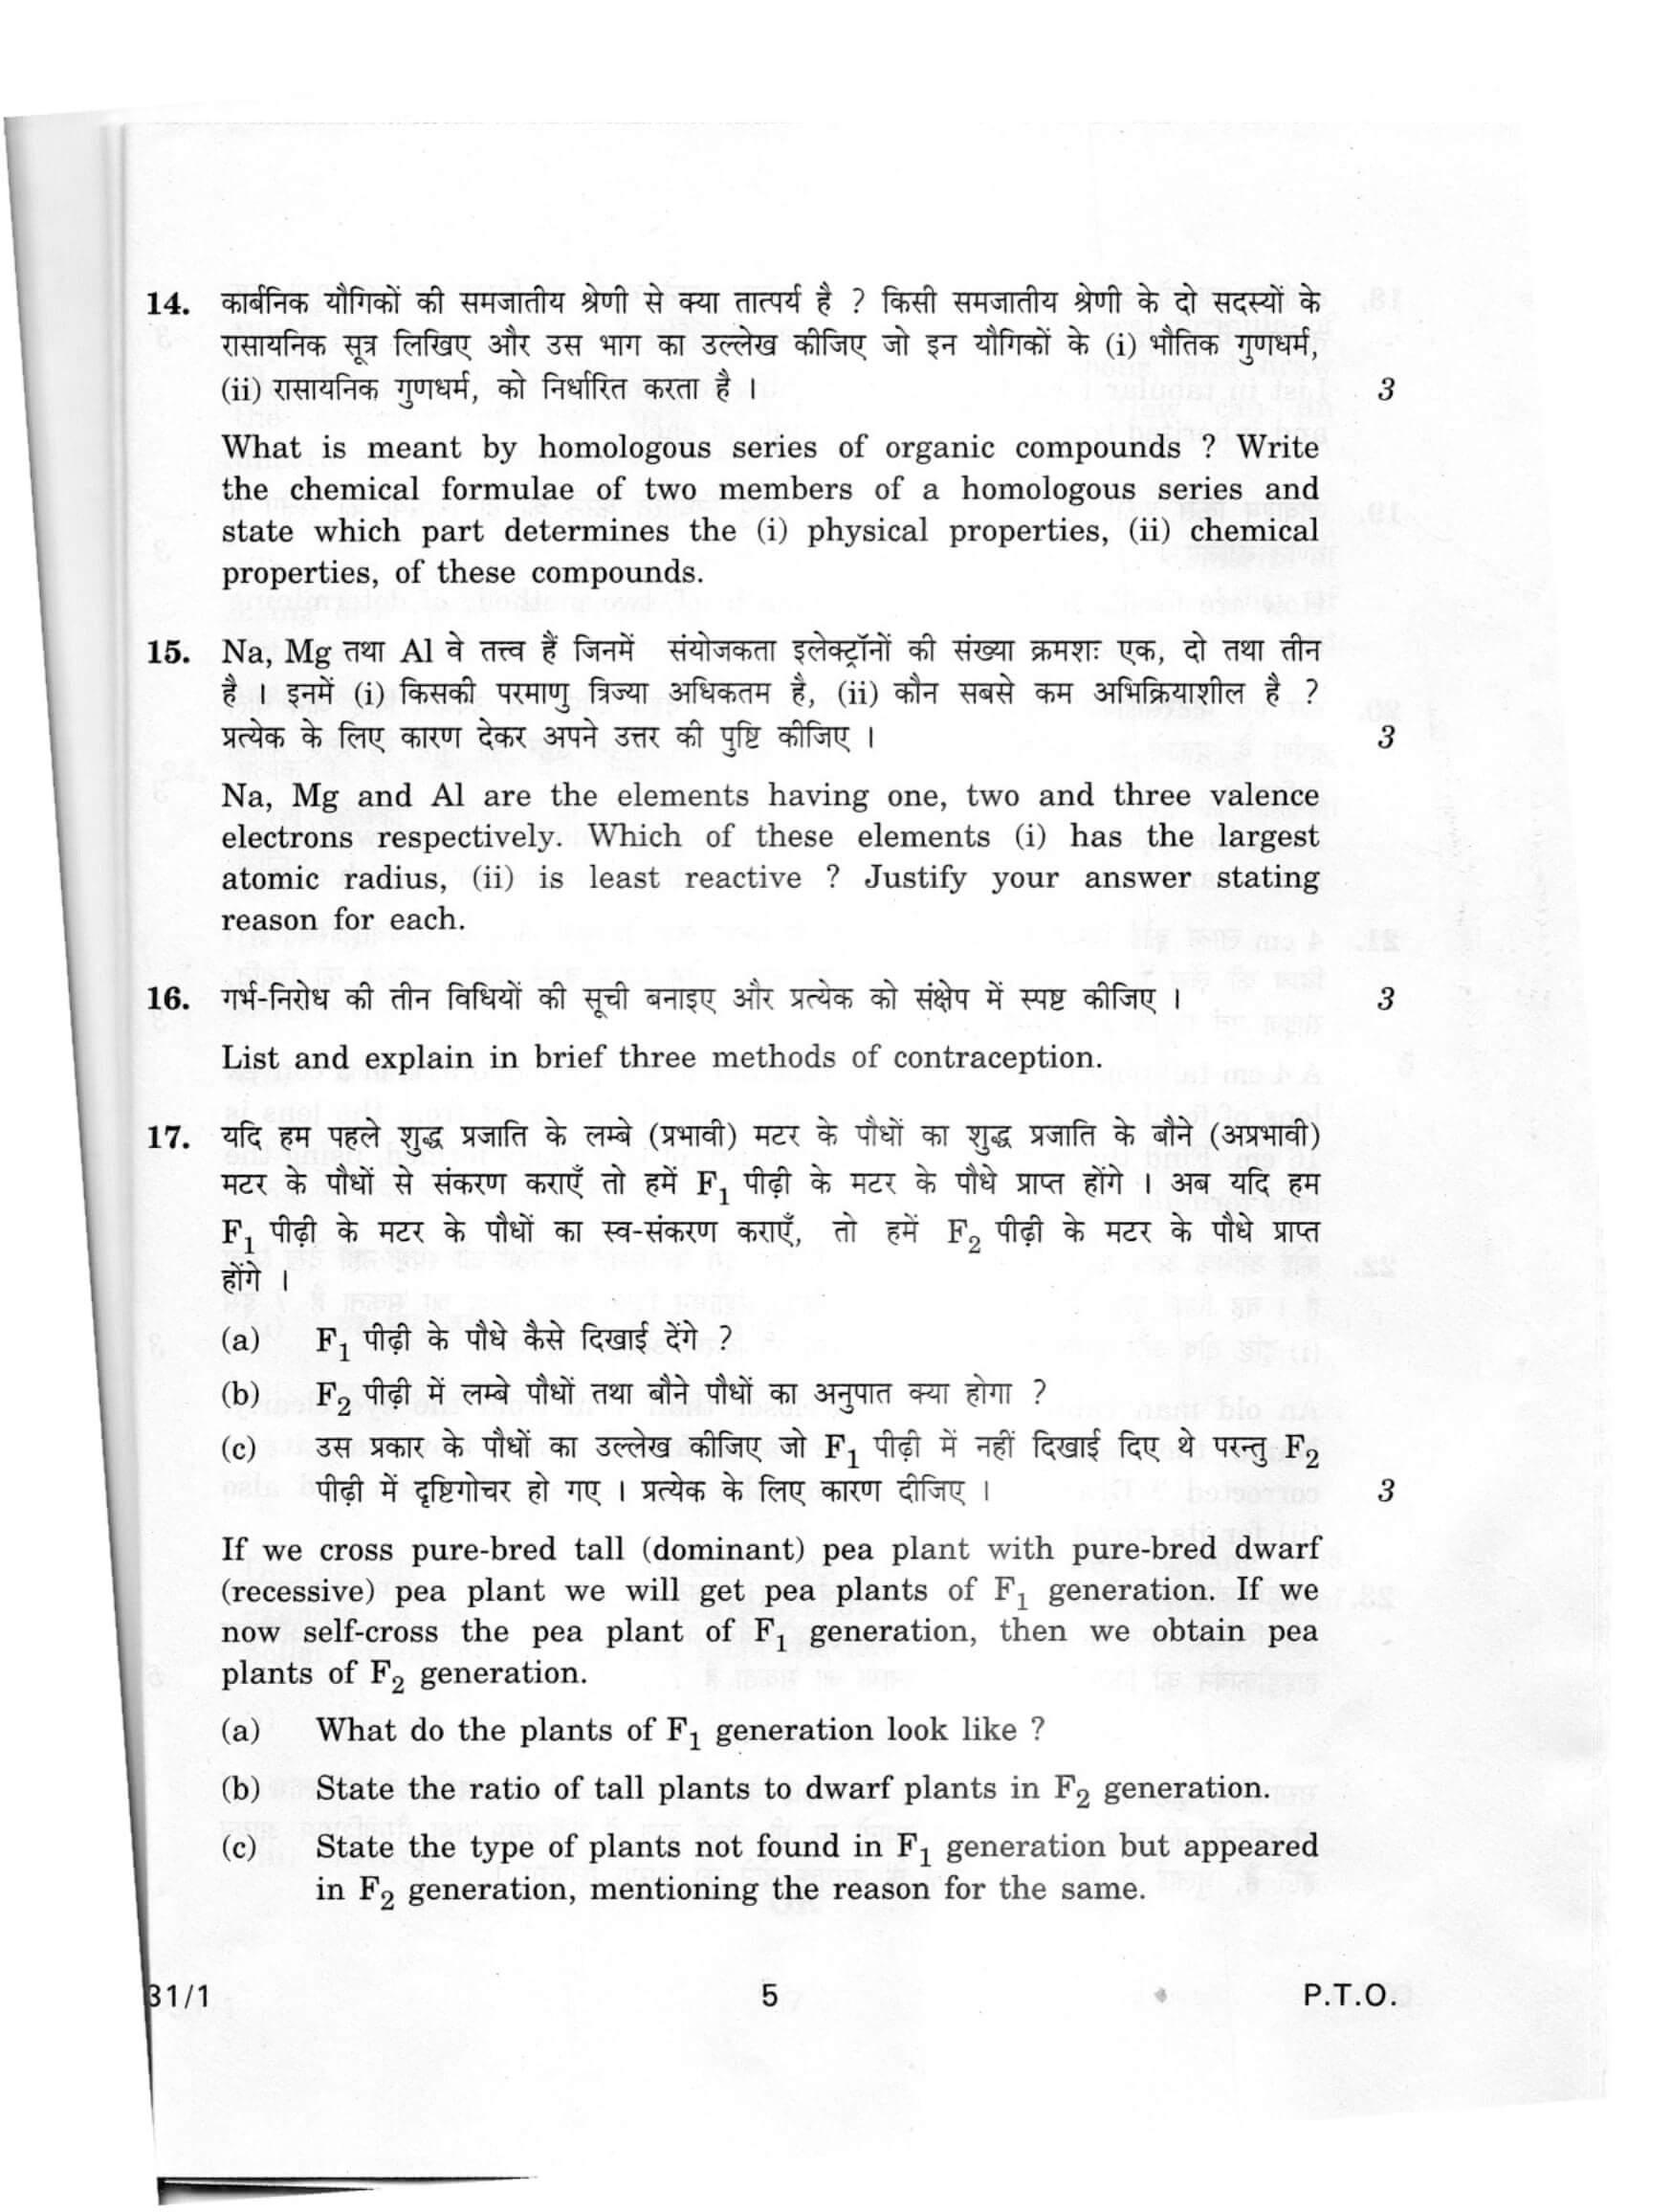 cbse class 10 science question paper 2012